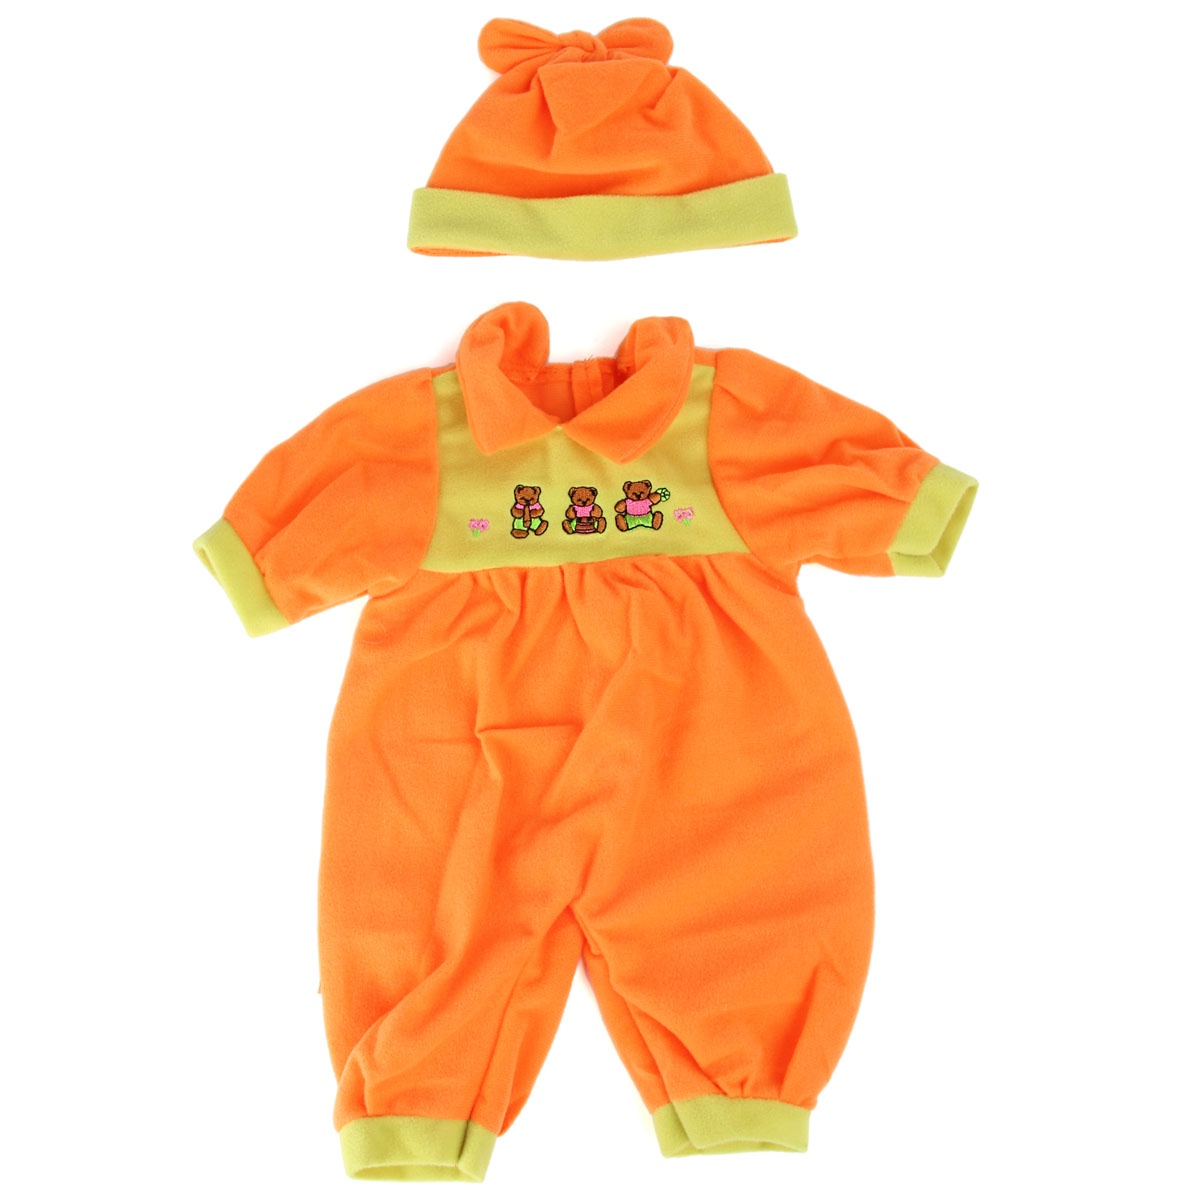 Одежда для кукол Veld Co 75899 цена